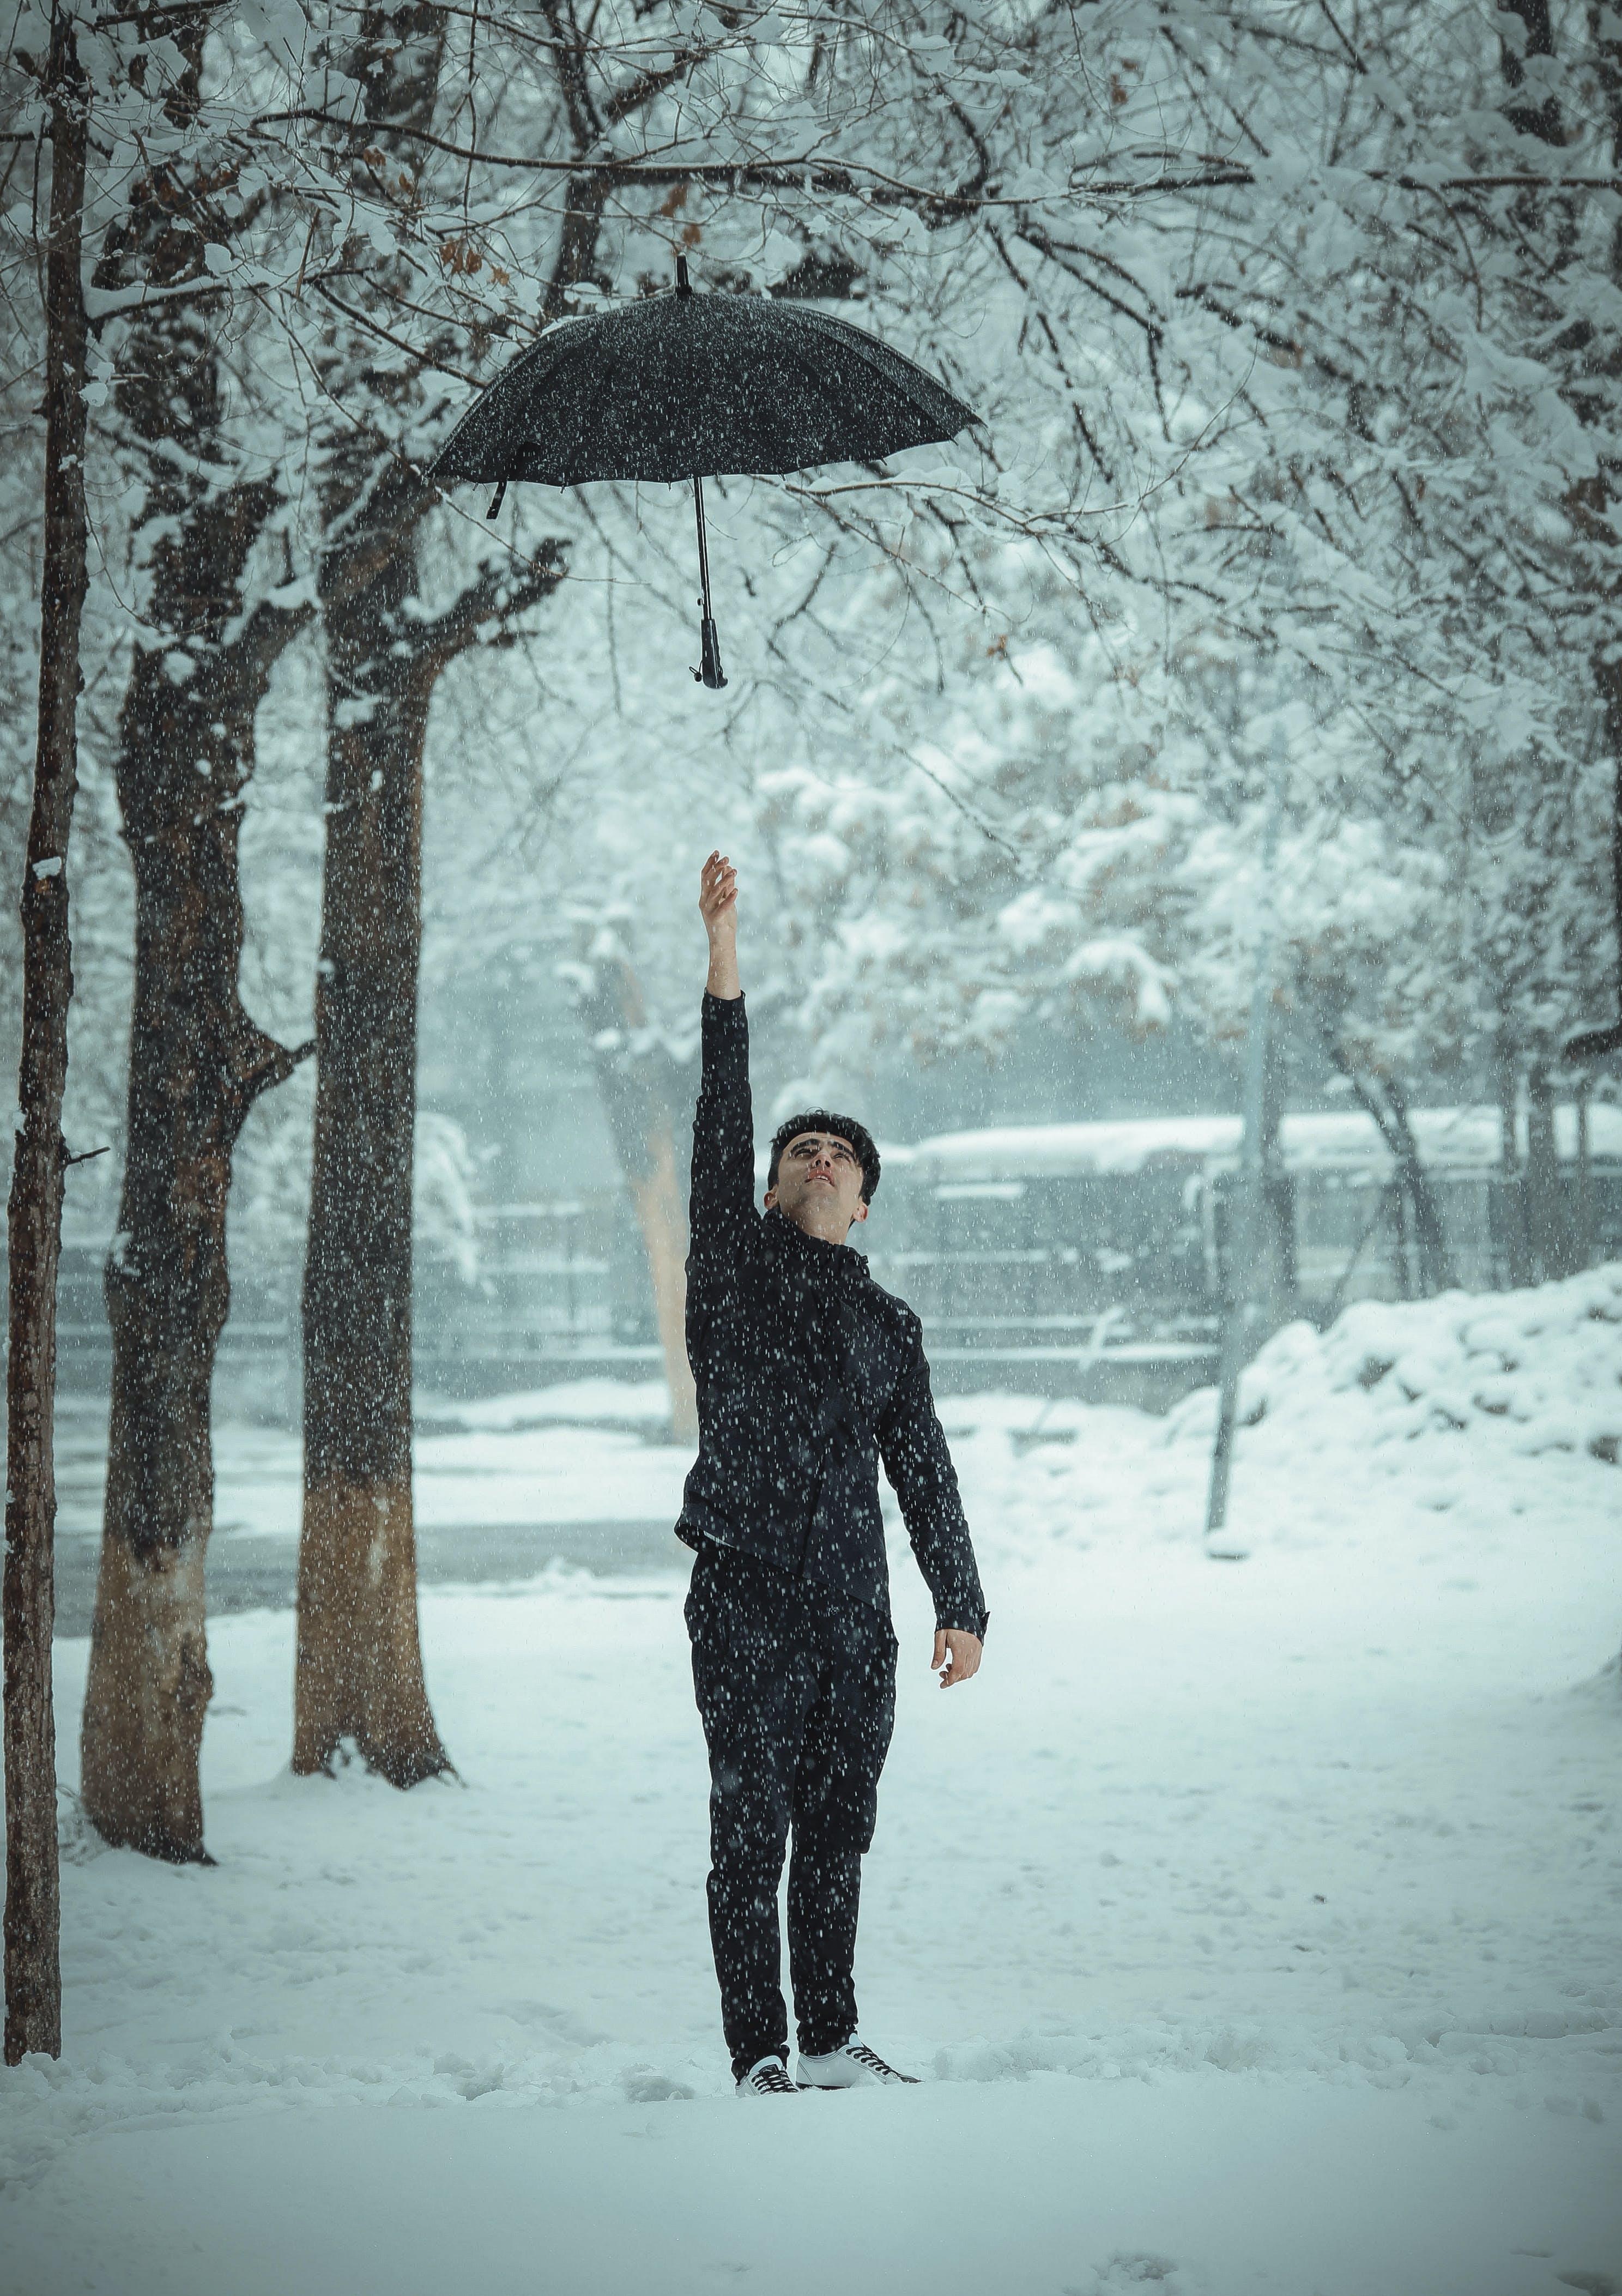 Free stock photo of beautiful, black clothes, fallen tree, falling